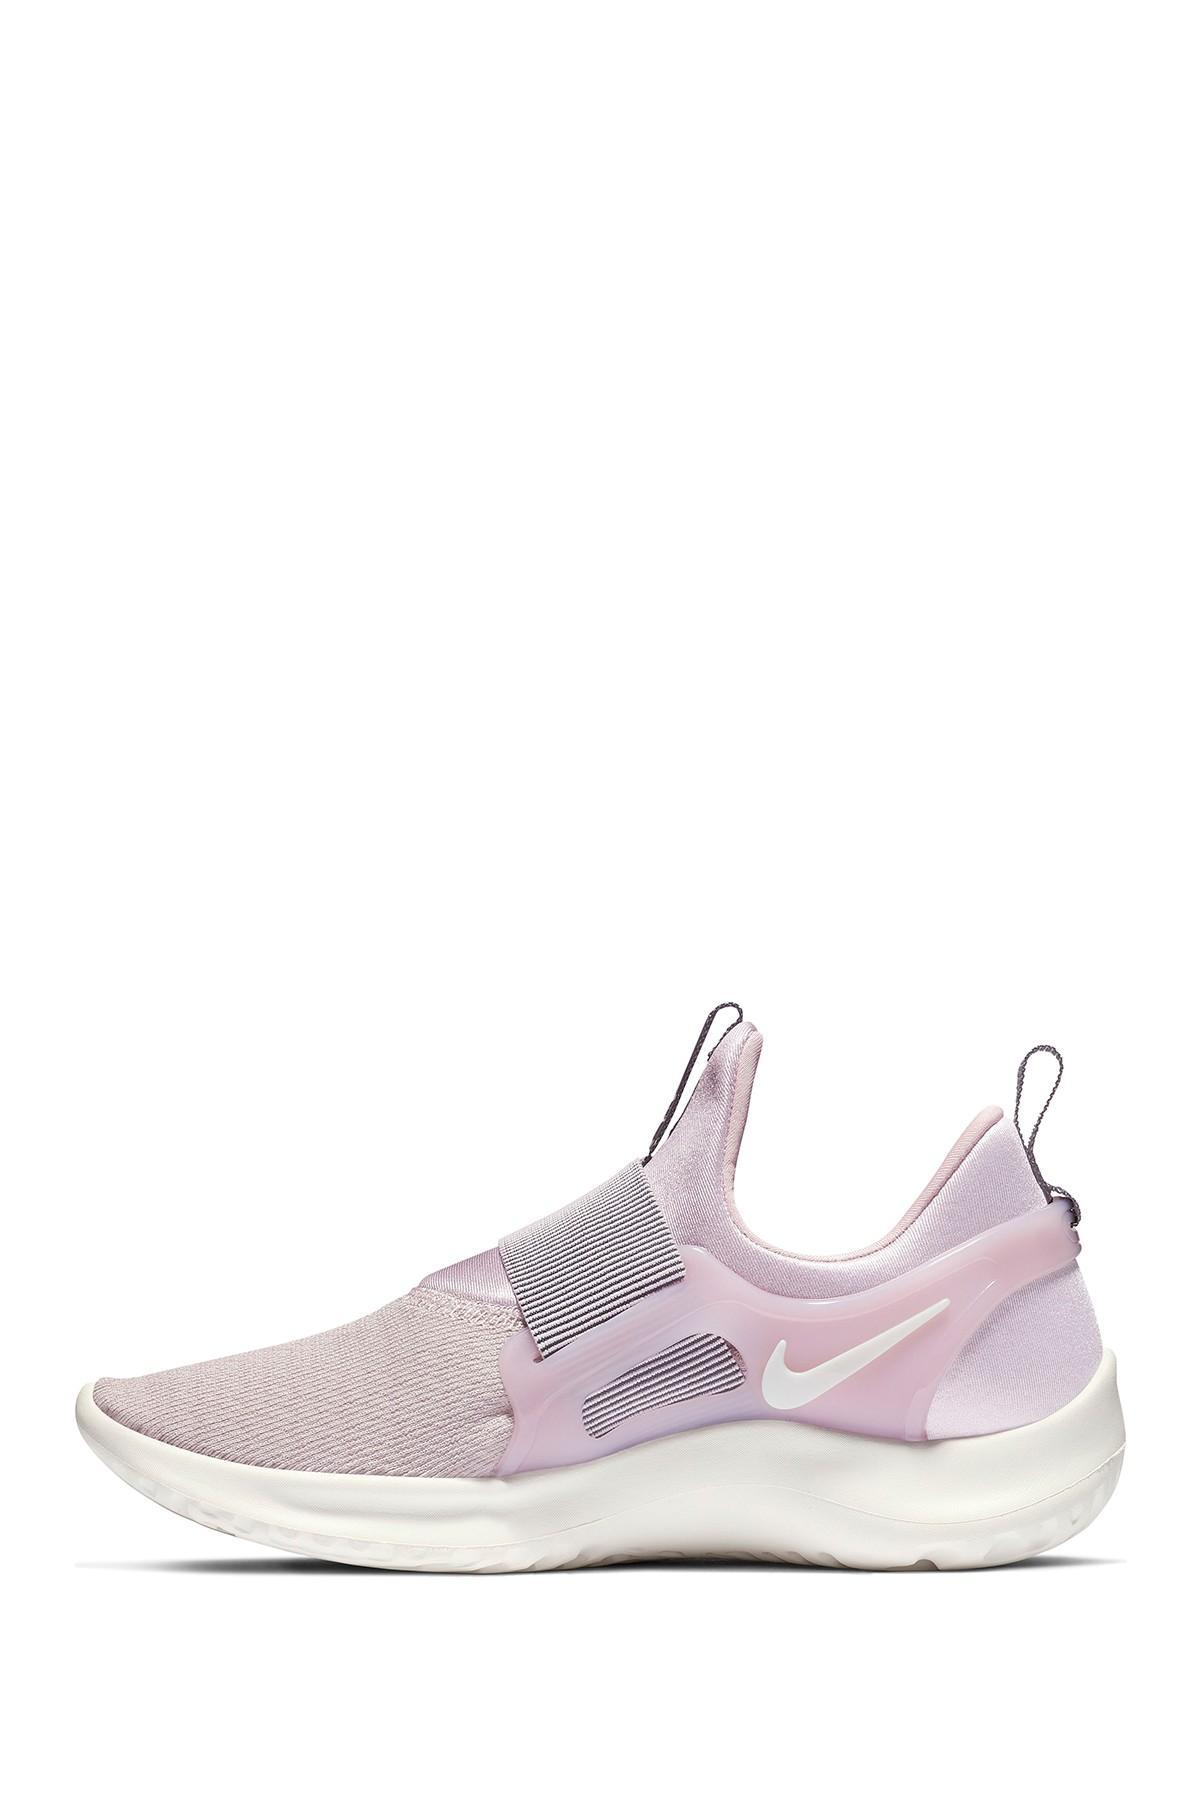 renew freedom running sneaker